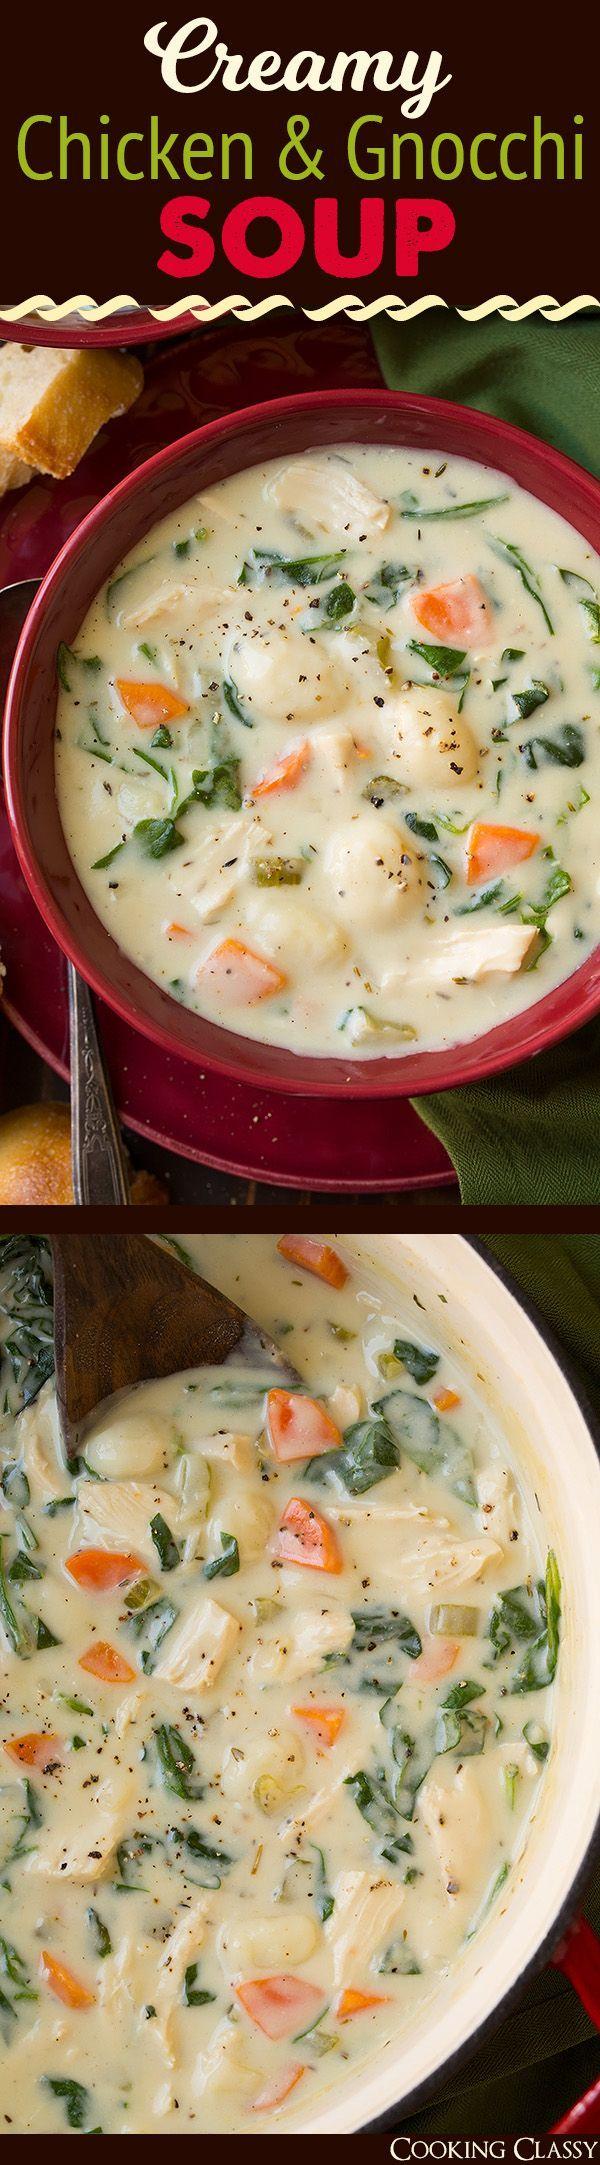 Creamy Chicken and Gnocchi Soup (Olive Garden Copycat